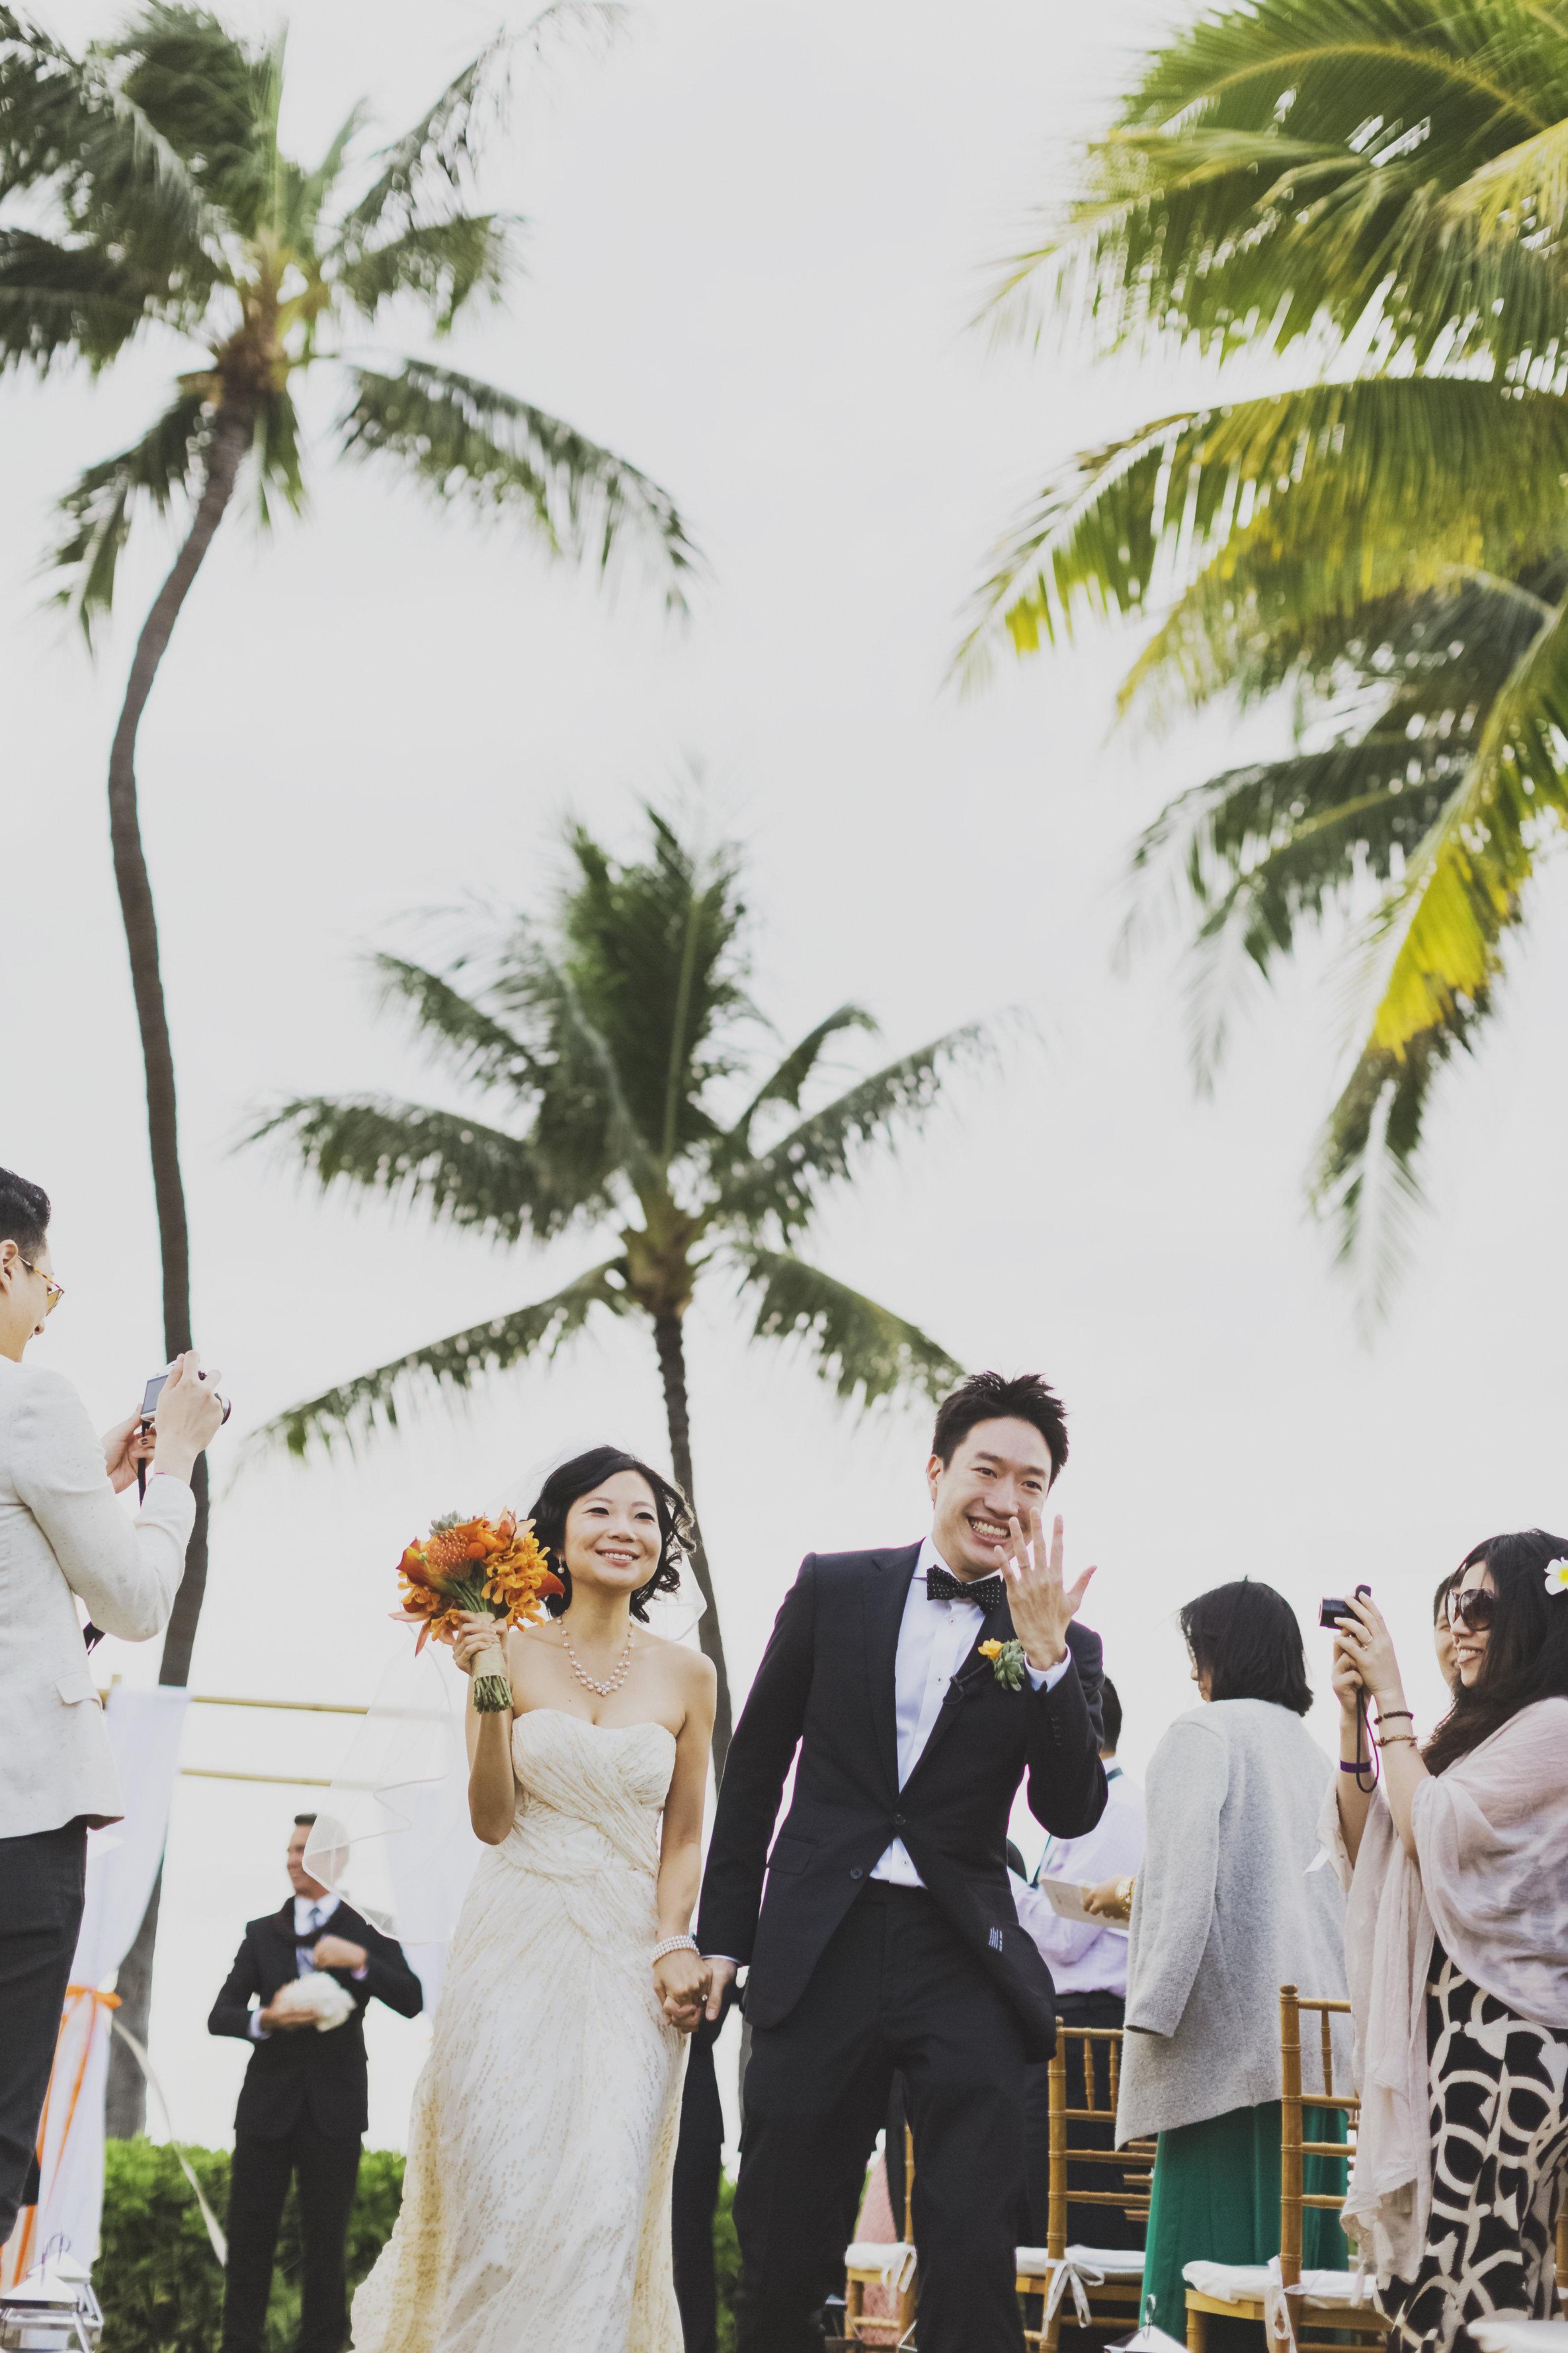 angie-diaz-photography-oahu-wedding-lanikuhonoa-shenshen-marshall-35.jpg